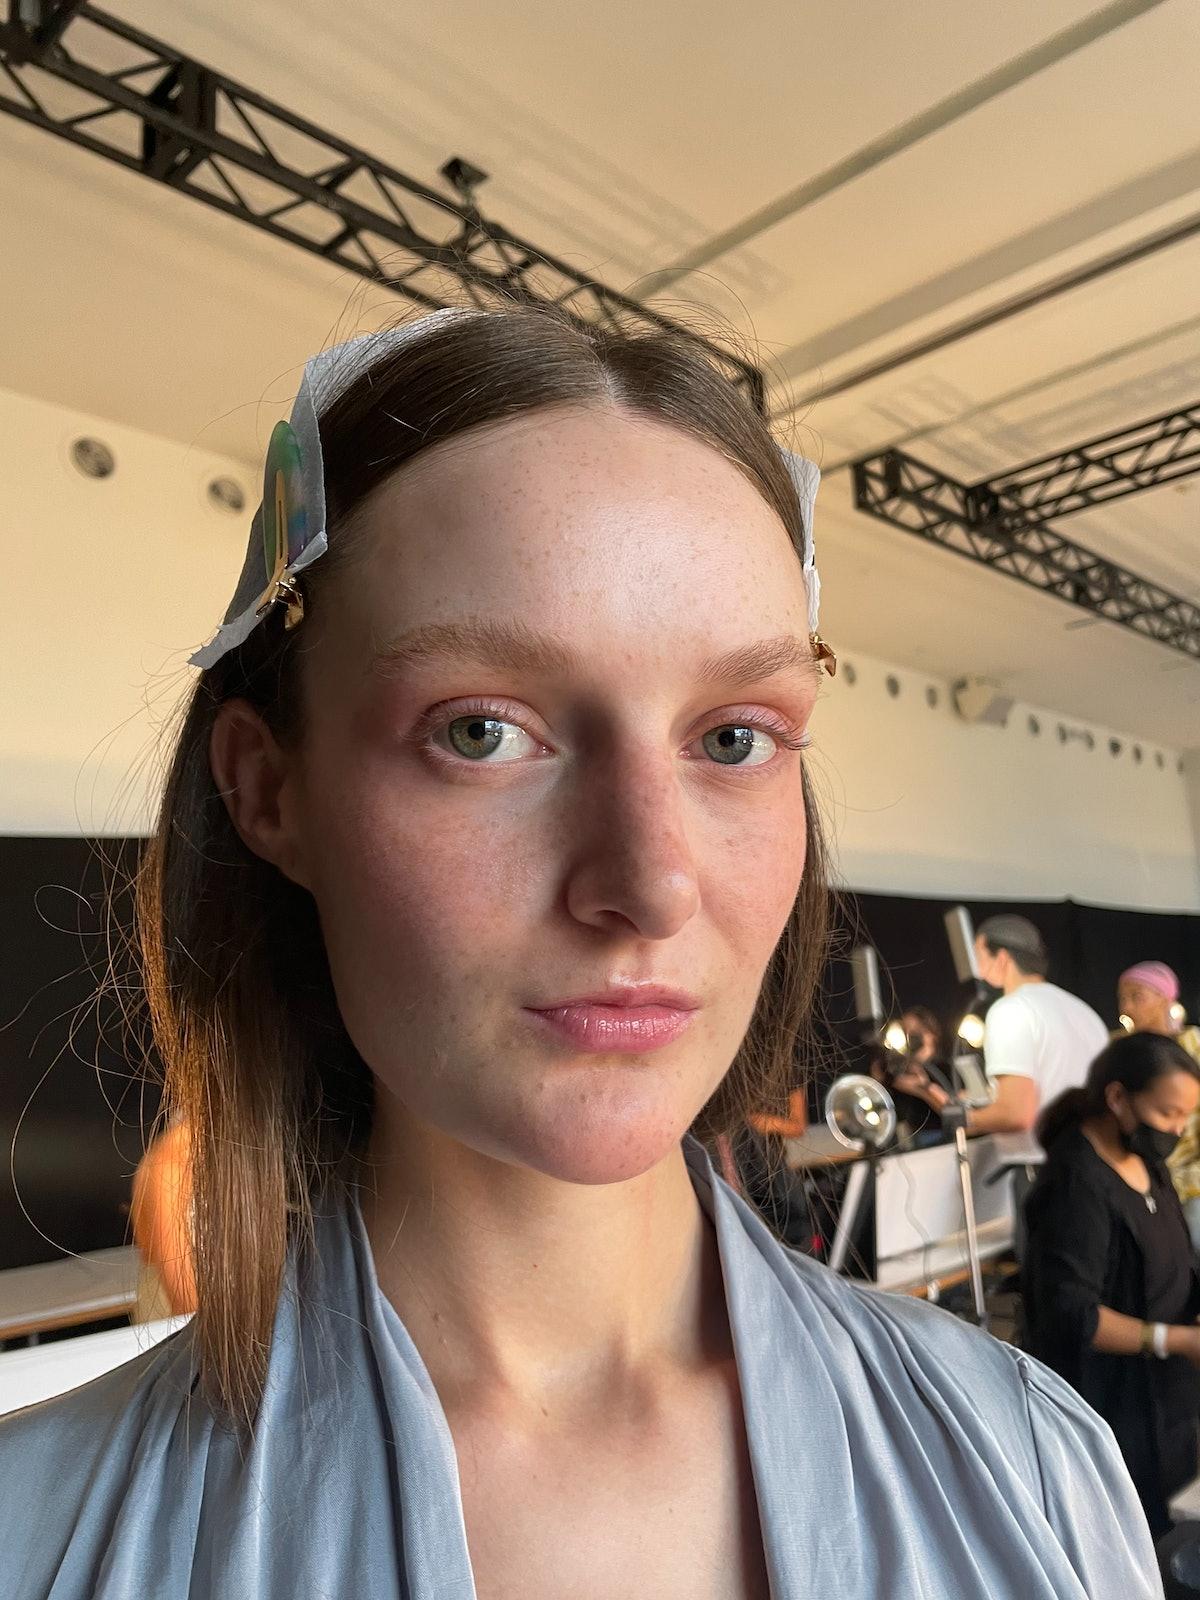 Bevza blush look on a model backstage